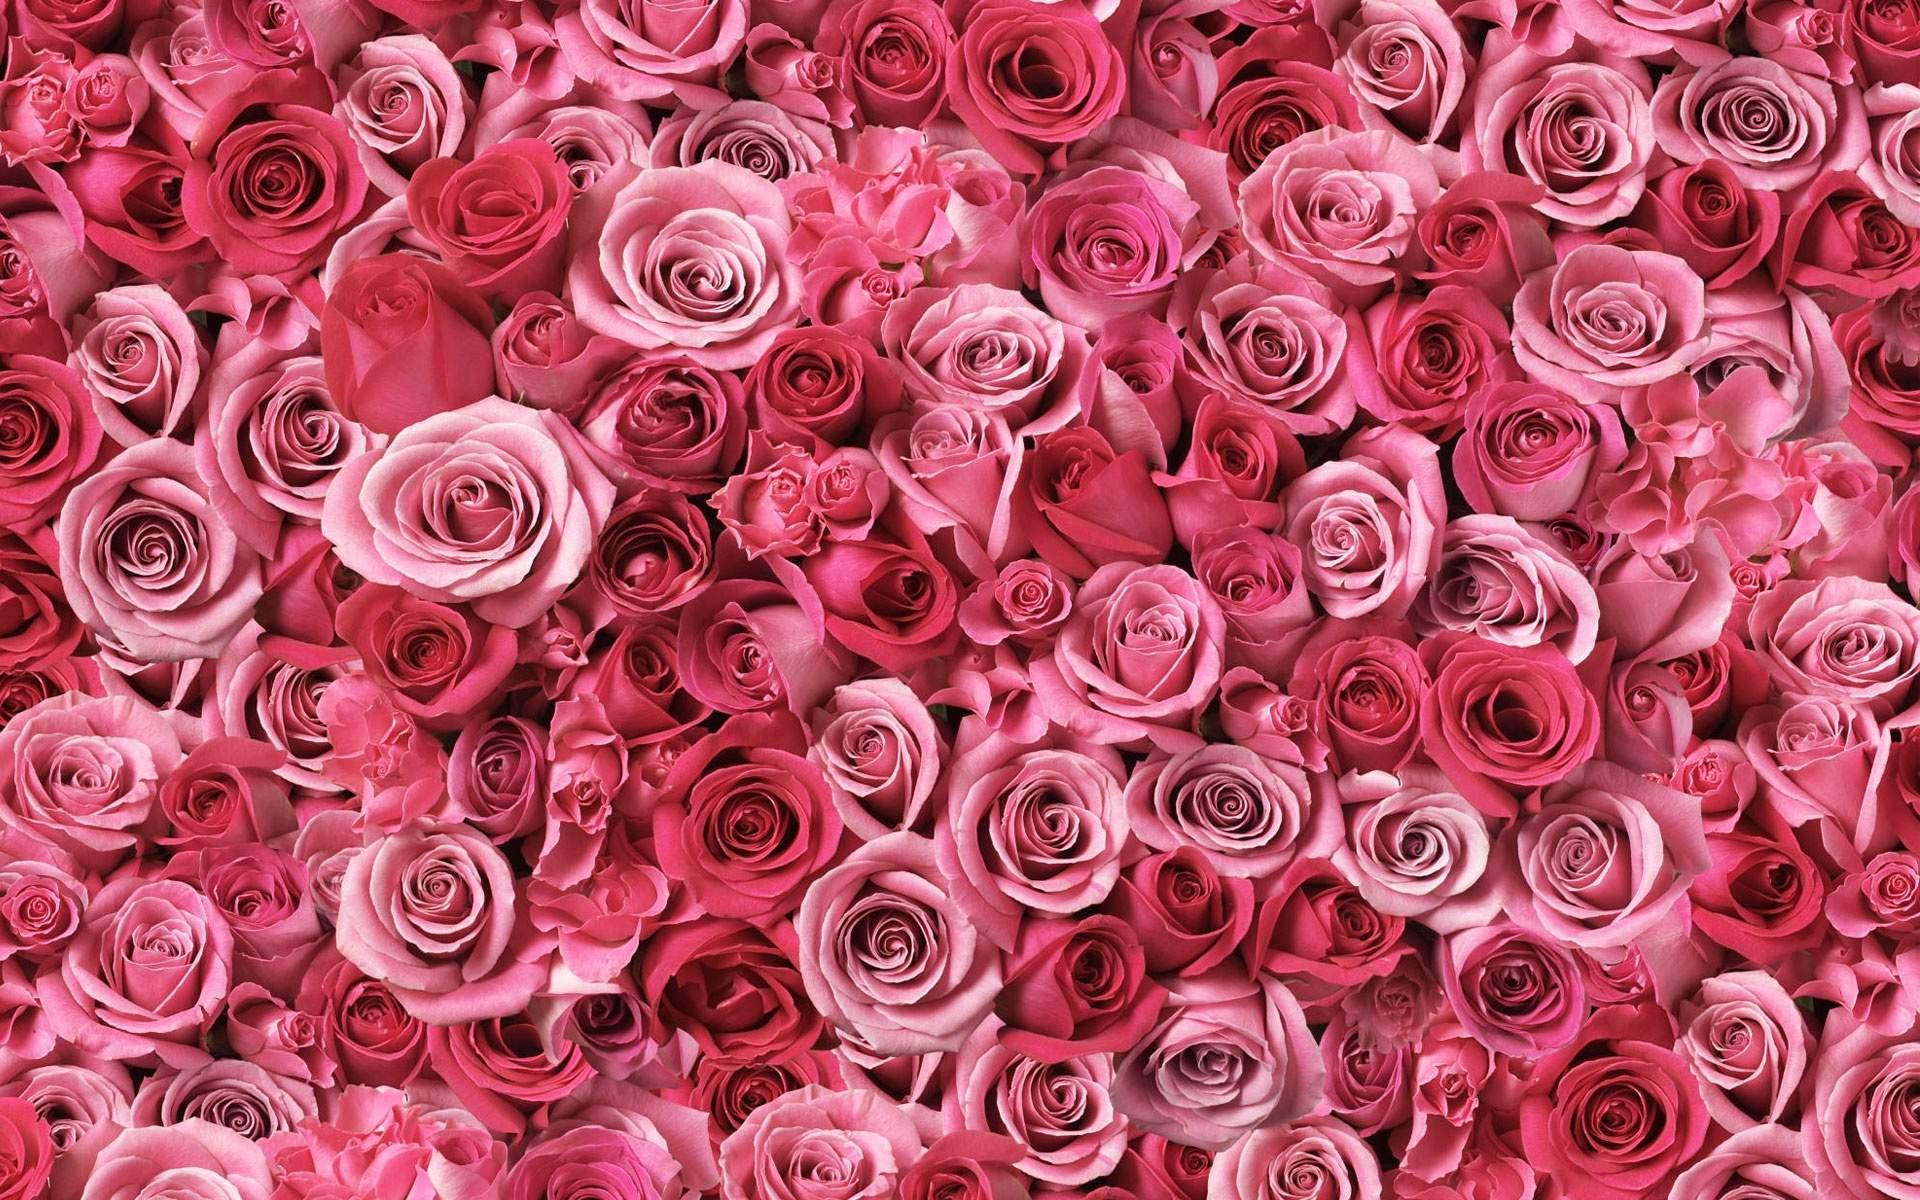 Rose flower wallpapers etamemibawa rose flower wallpapers mightylinksfo Choice Image